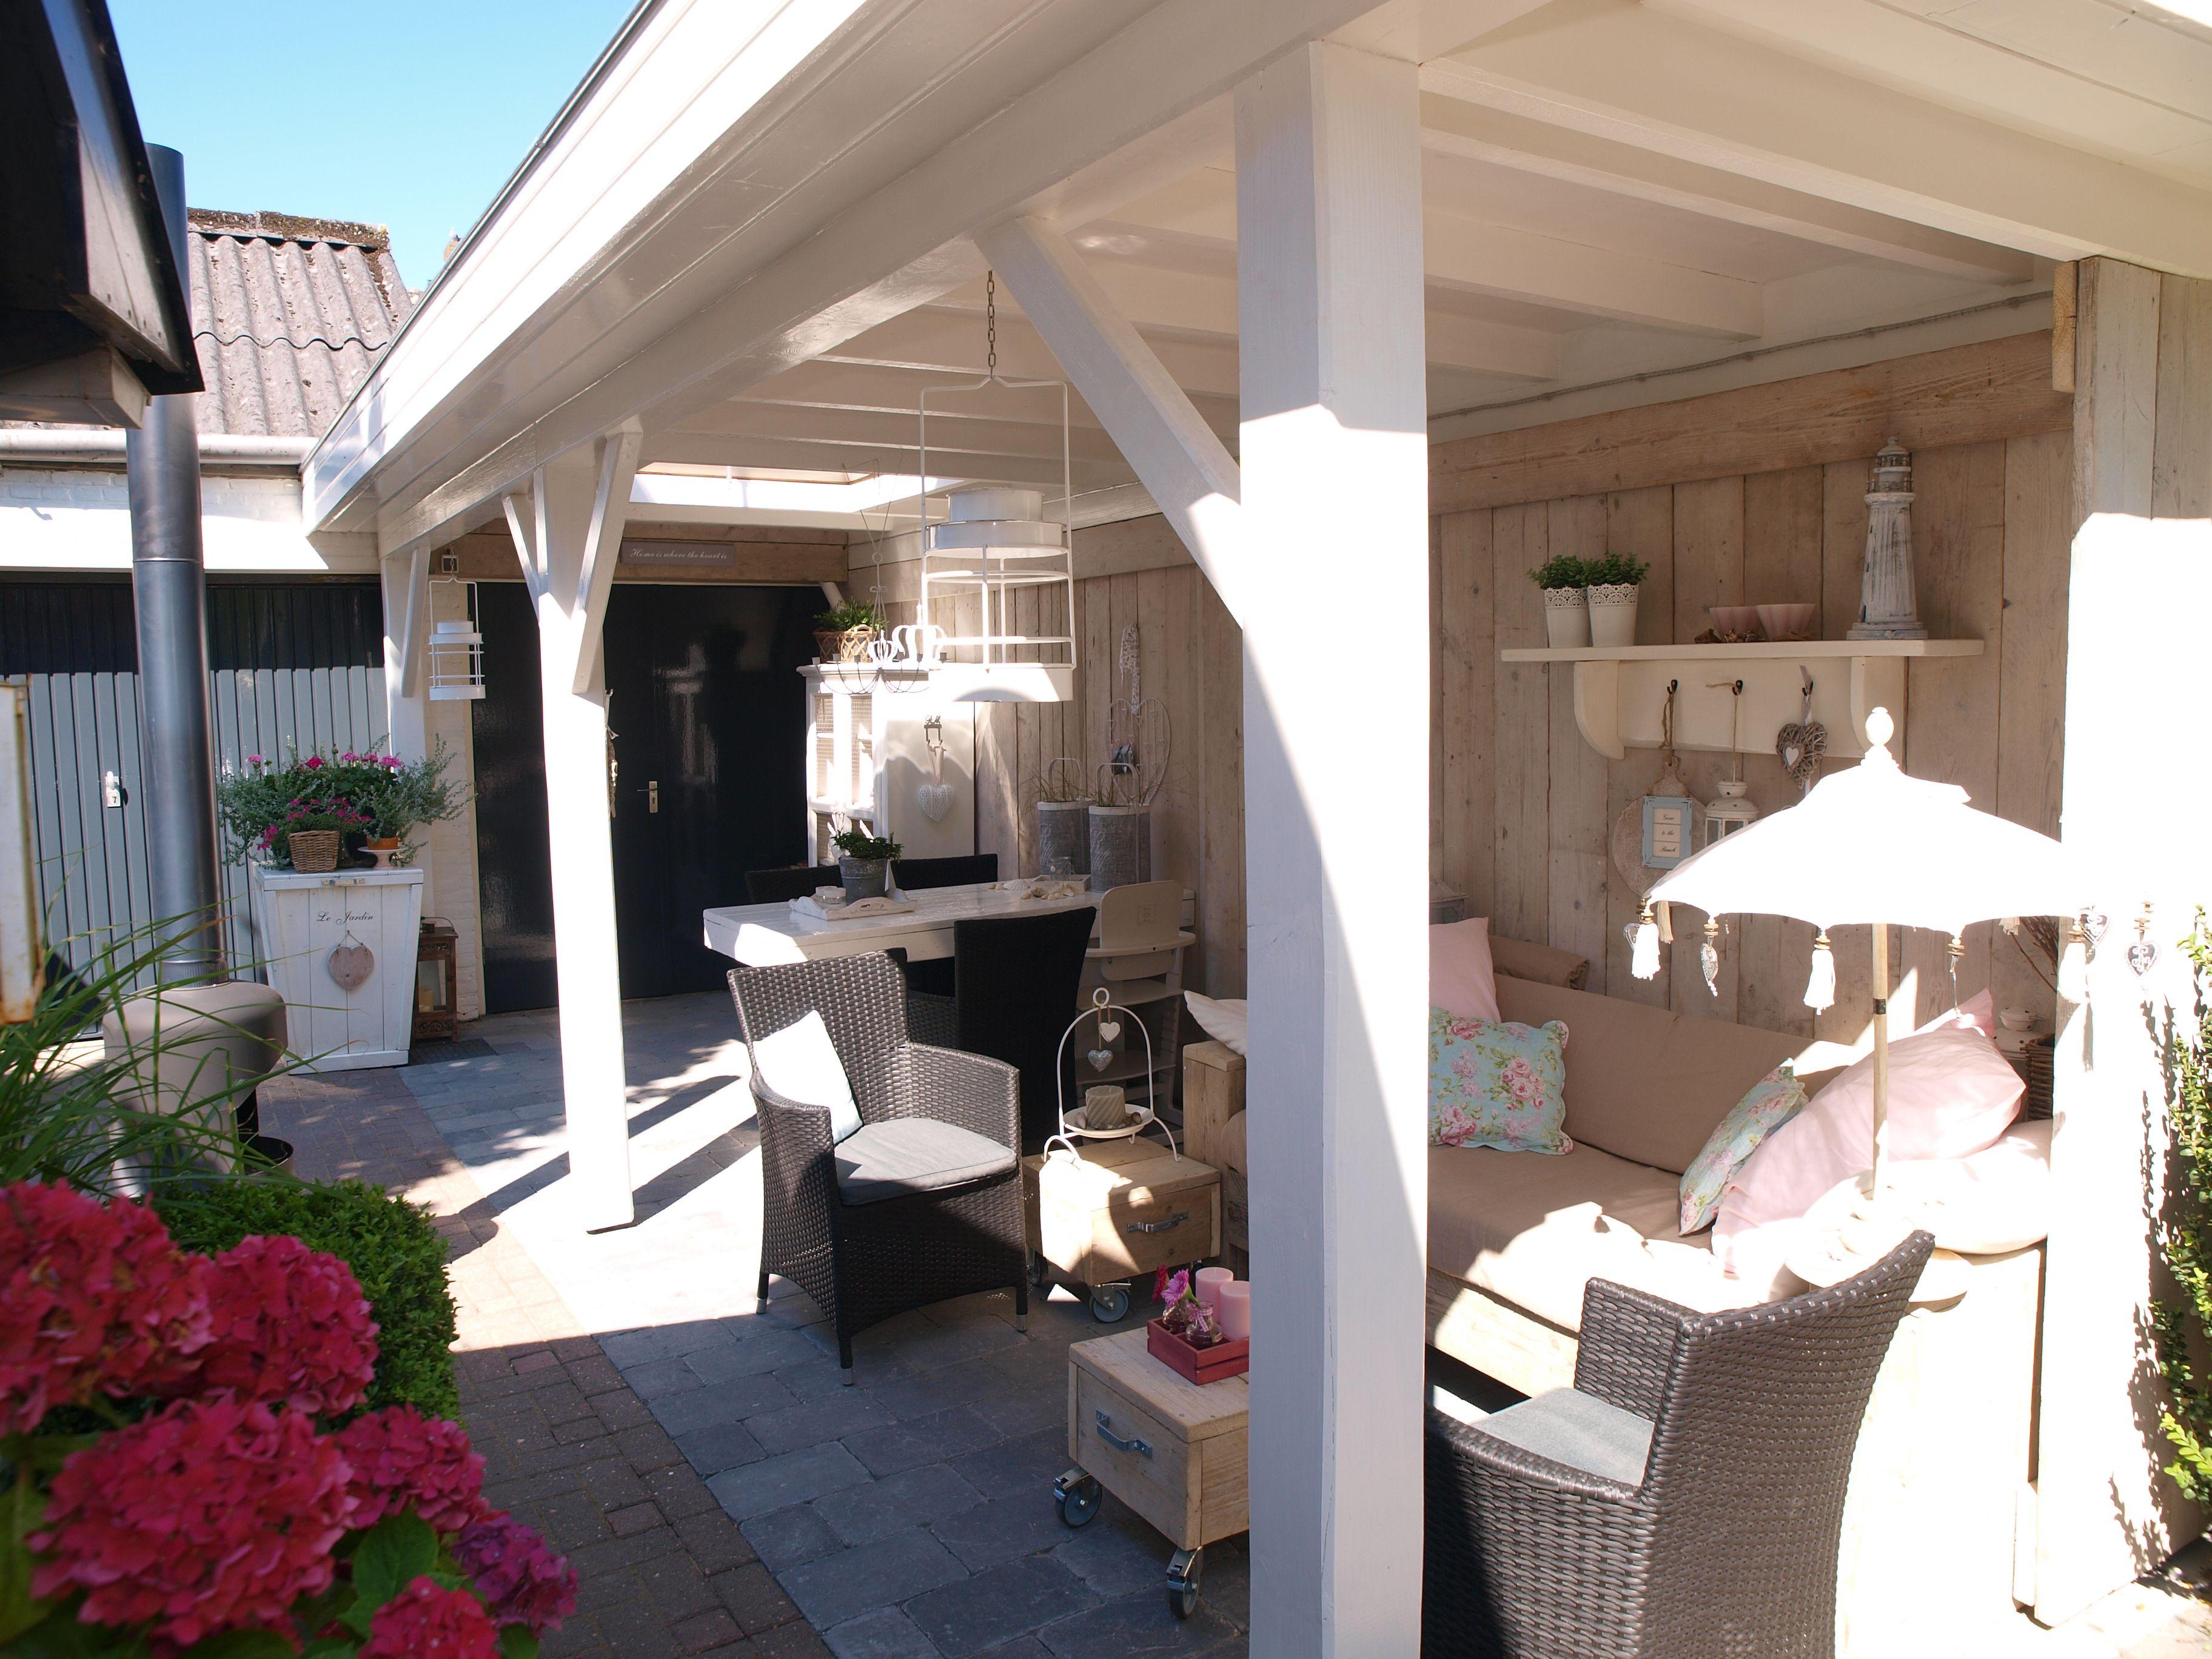 Veranda van diana tuin pinterest verandas for Diana tuin